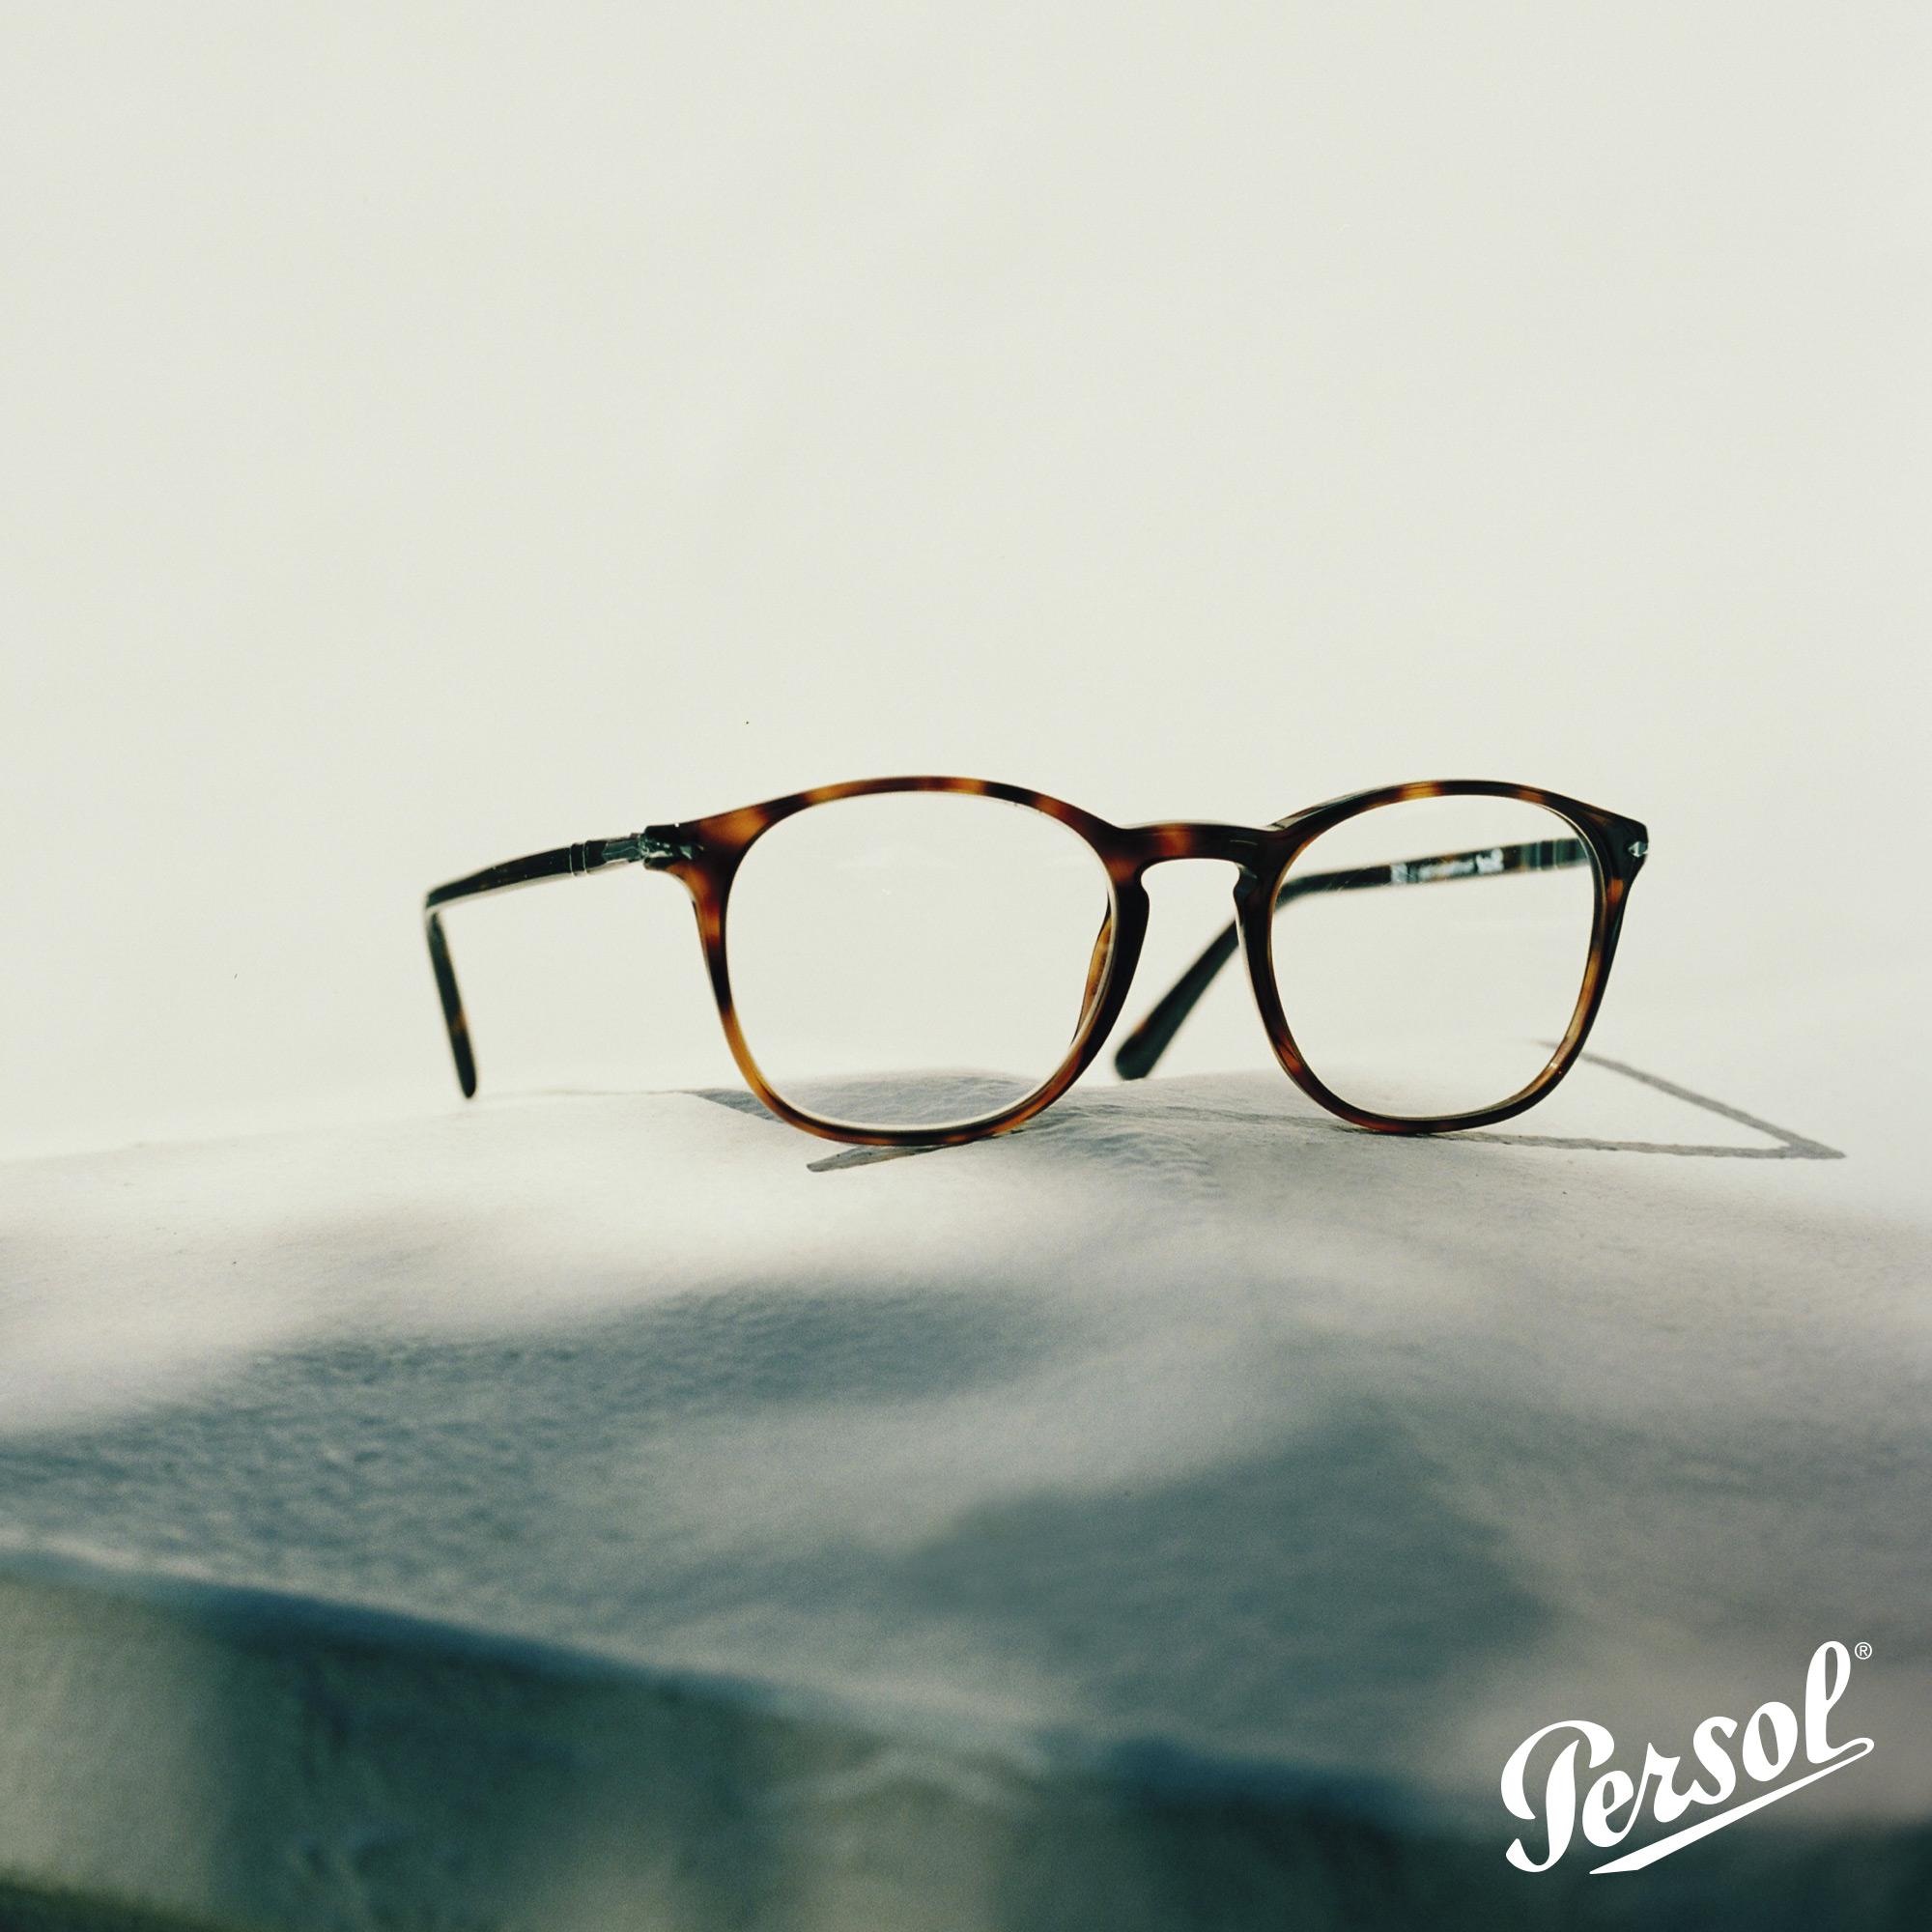 Persol - Brown 3 - Ótica Pitosga